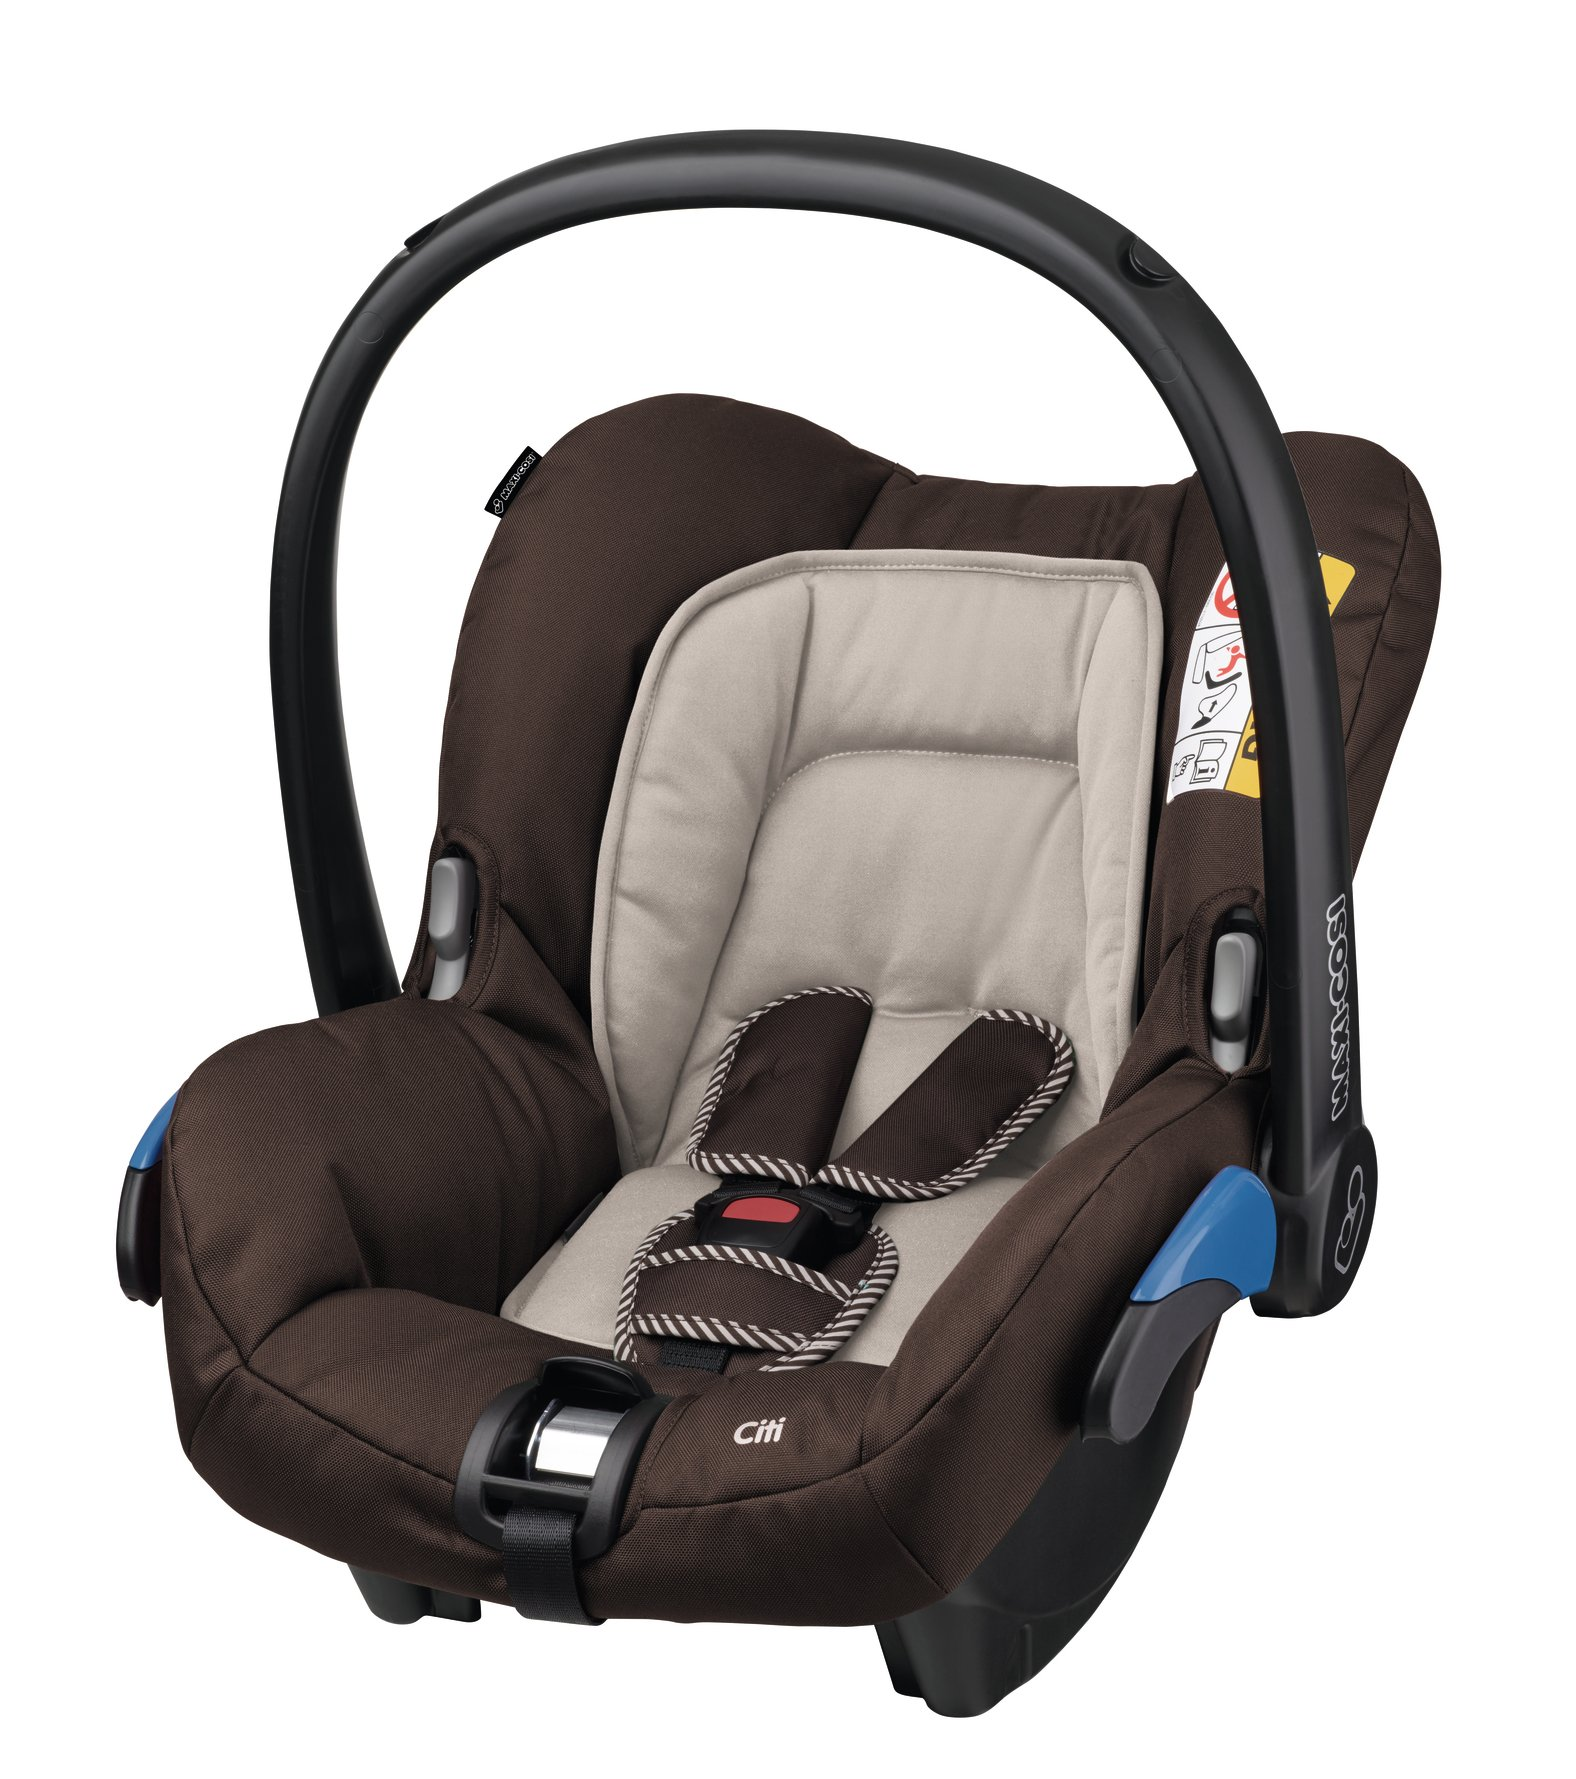 Maxi Cosi Citi : buy maxi cosi citi car seat 0 13 kg ~ Watch28wear.com Haus und Dekorationen